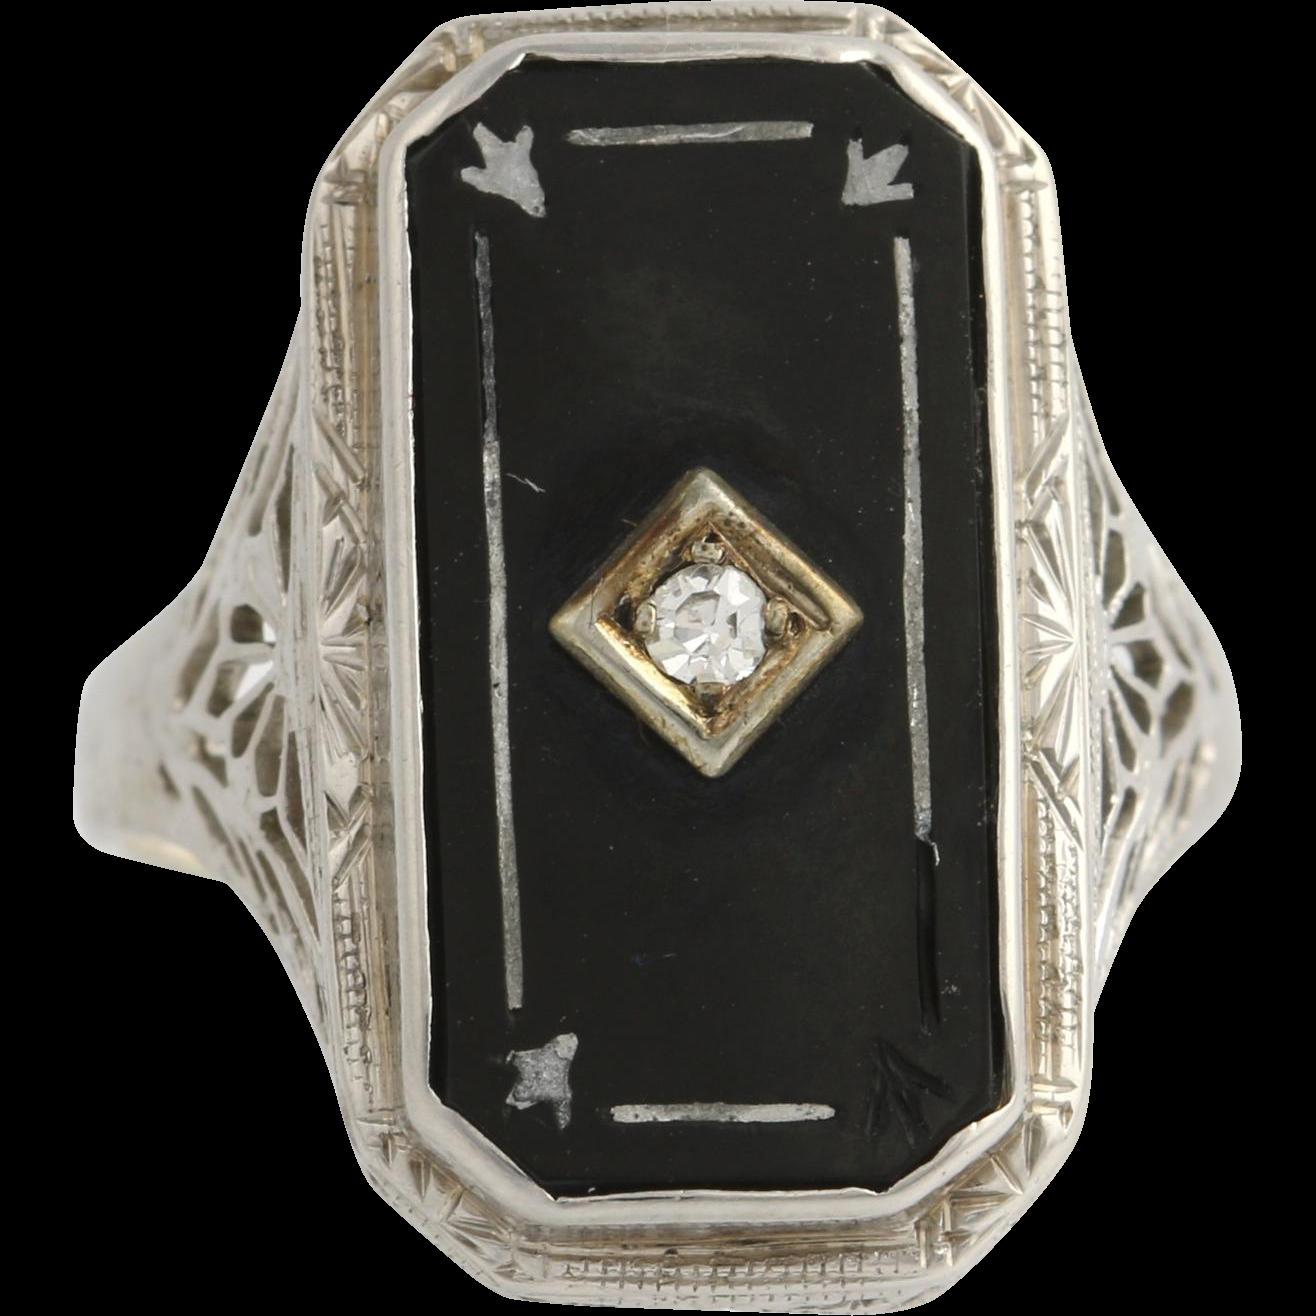 Art Deco Onyx & Diamond Ring - 14k White Gold Women's Size 6 Genuine .04ctw